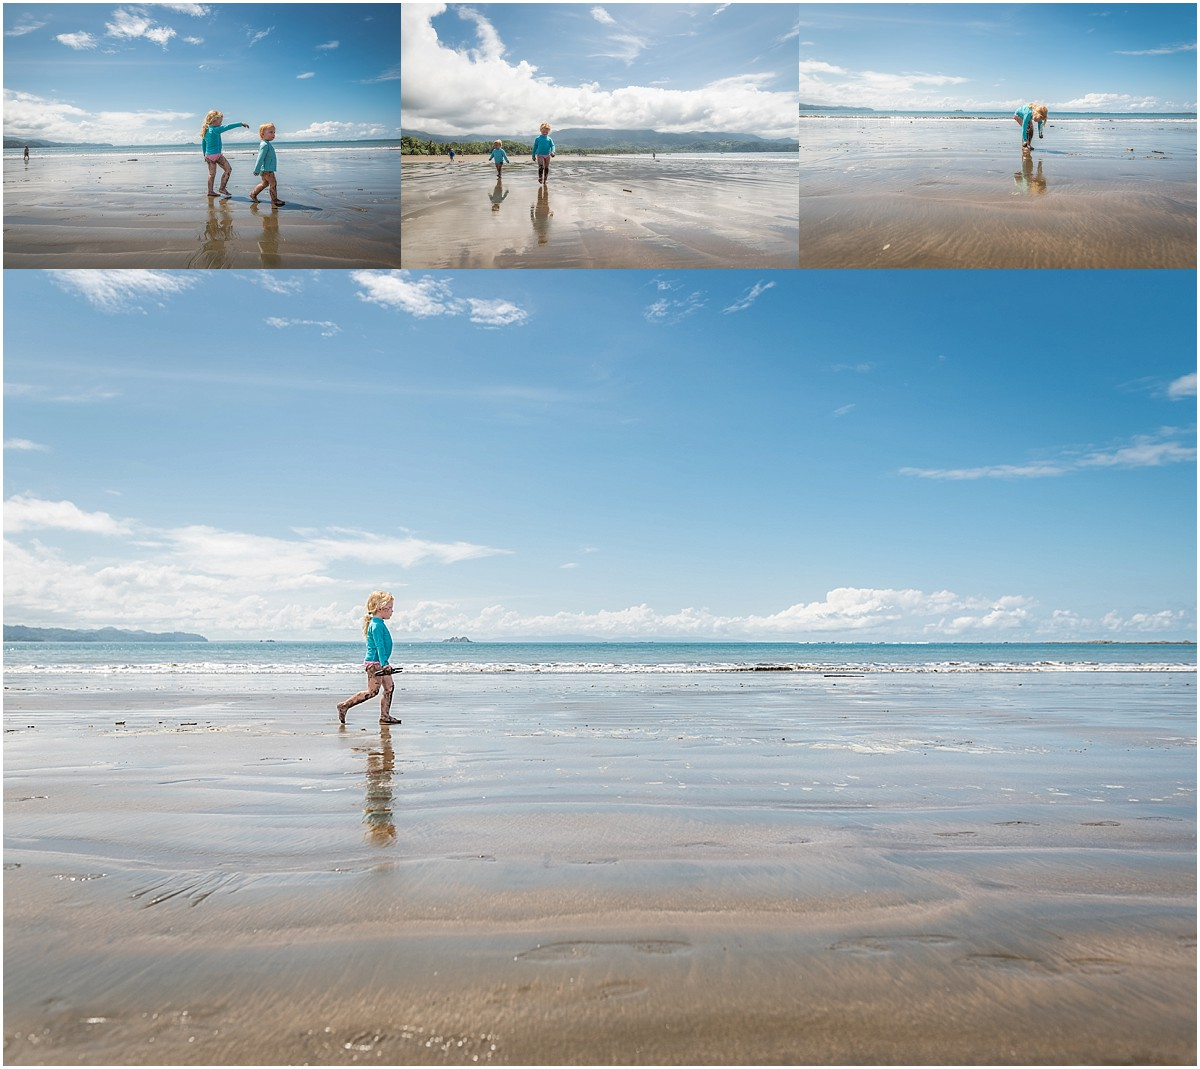 Ashley_Rogers_Photography_South_Florida_Photographer_Orlando_Photographer_Costa_Rica_Photographer_1217.jpg